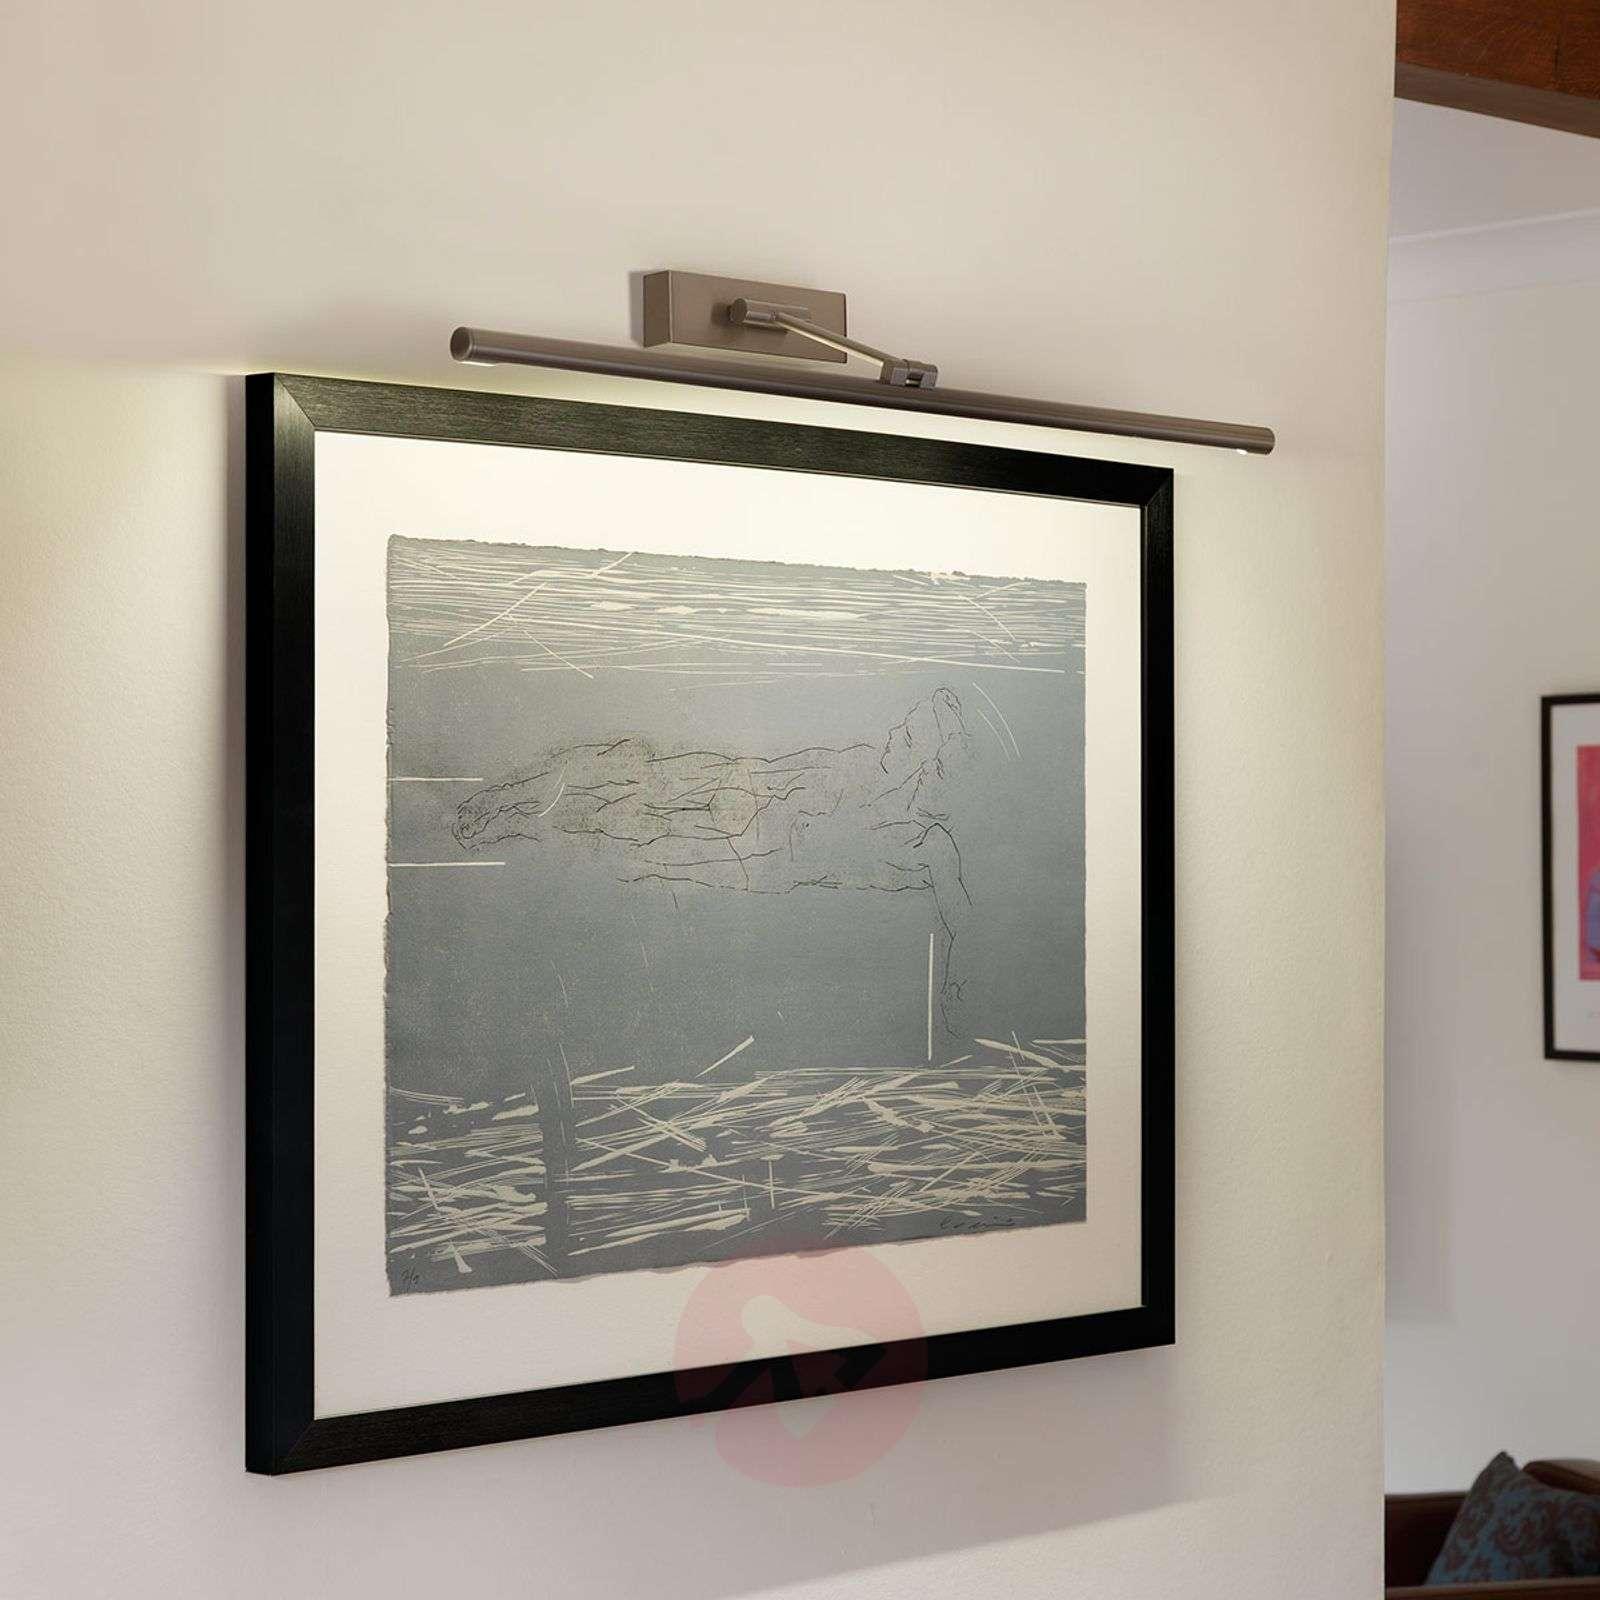 Goya 760 LED Picture Light Beautiful-1020474X-03